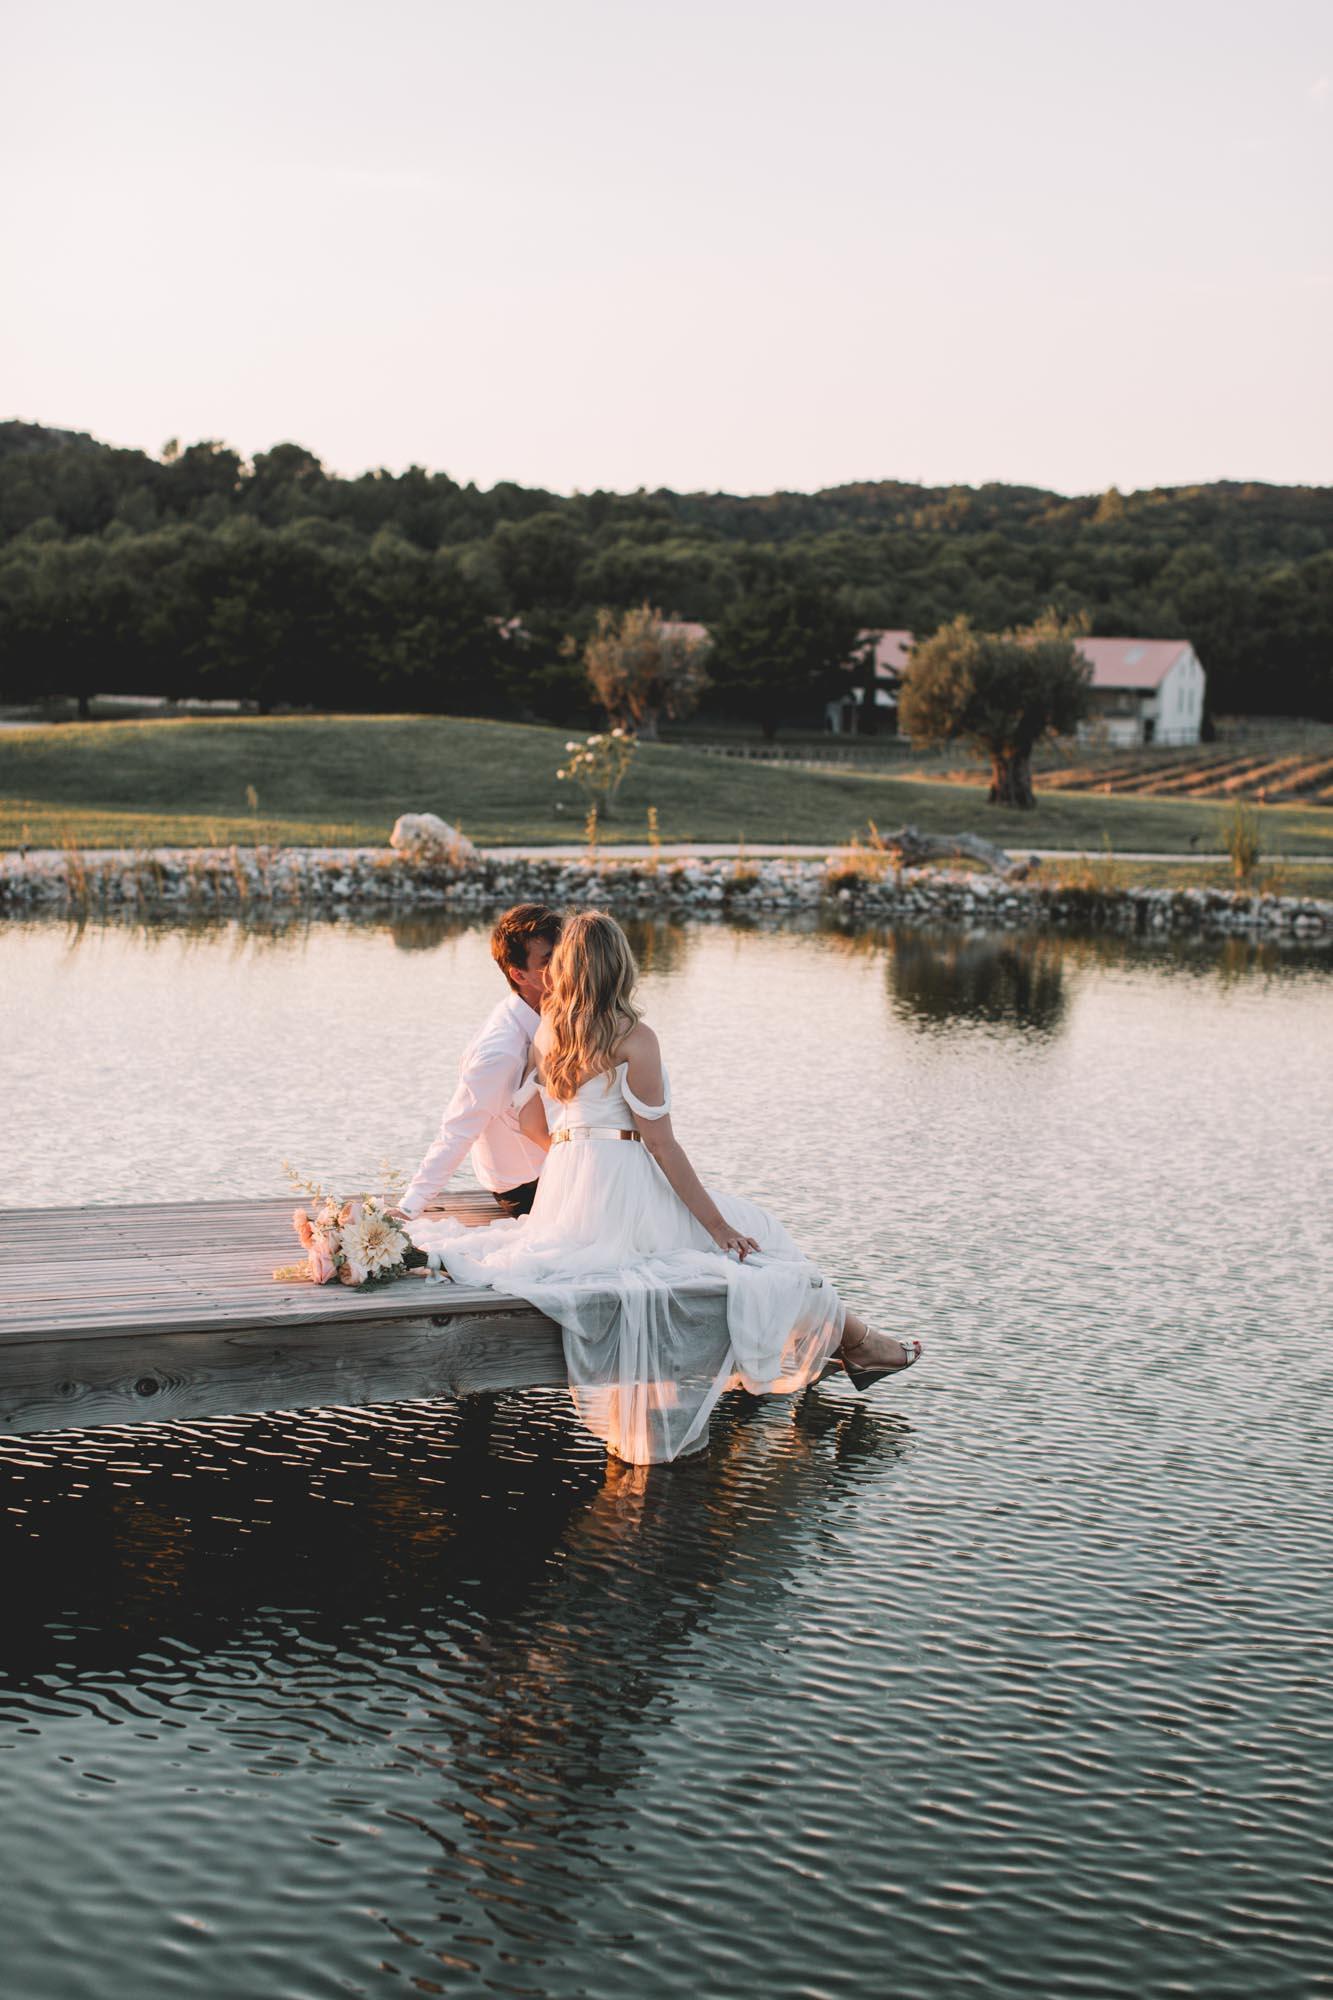 KATHARINA + DIMITRI_DOMAINES DE PATRAS_PHOTOGRAPHE MARIAGE_LES BANDITS-12